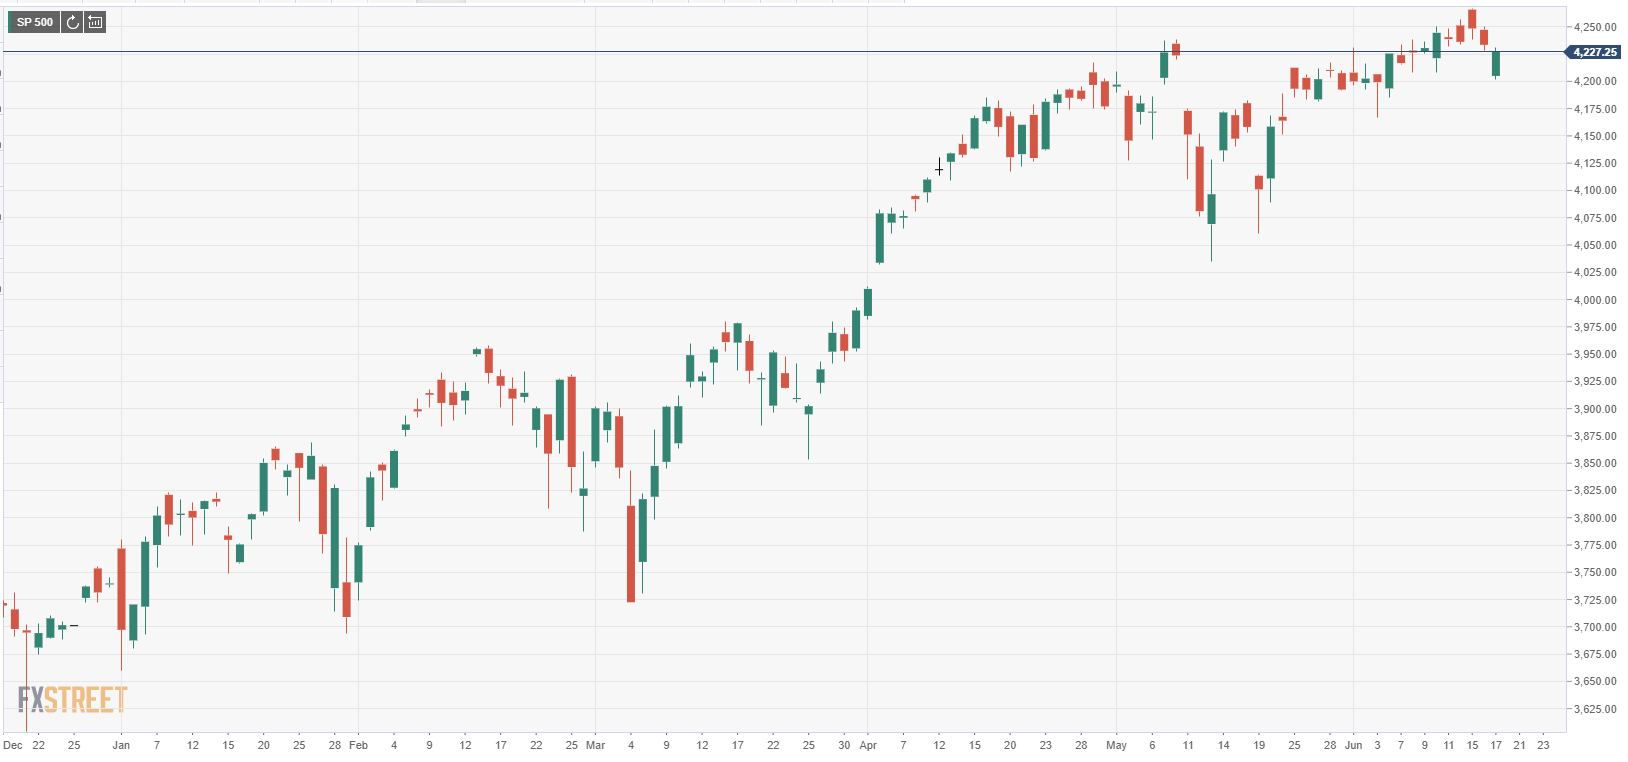 Grafik S&P 500